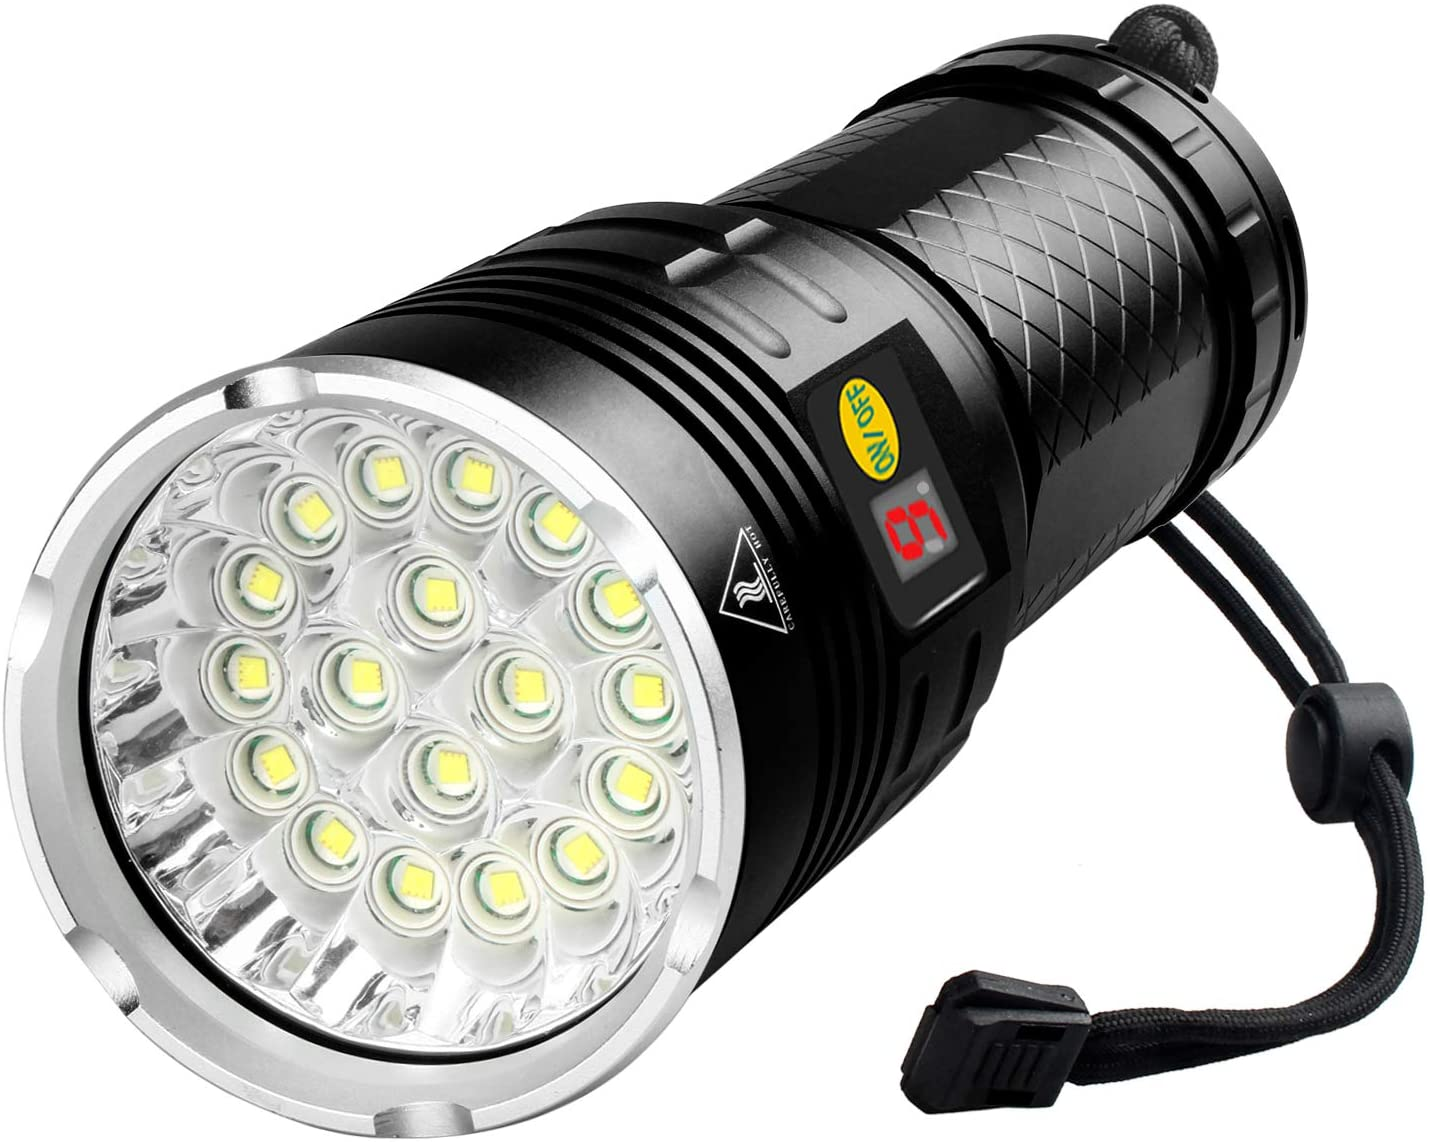 Woputne 18 LEDs Flashlight 10000 Lumen, Type-C Rechargeable, Bright Flashlight High Lumens, Powerful Flashlight with Battery Power Display